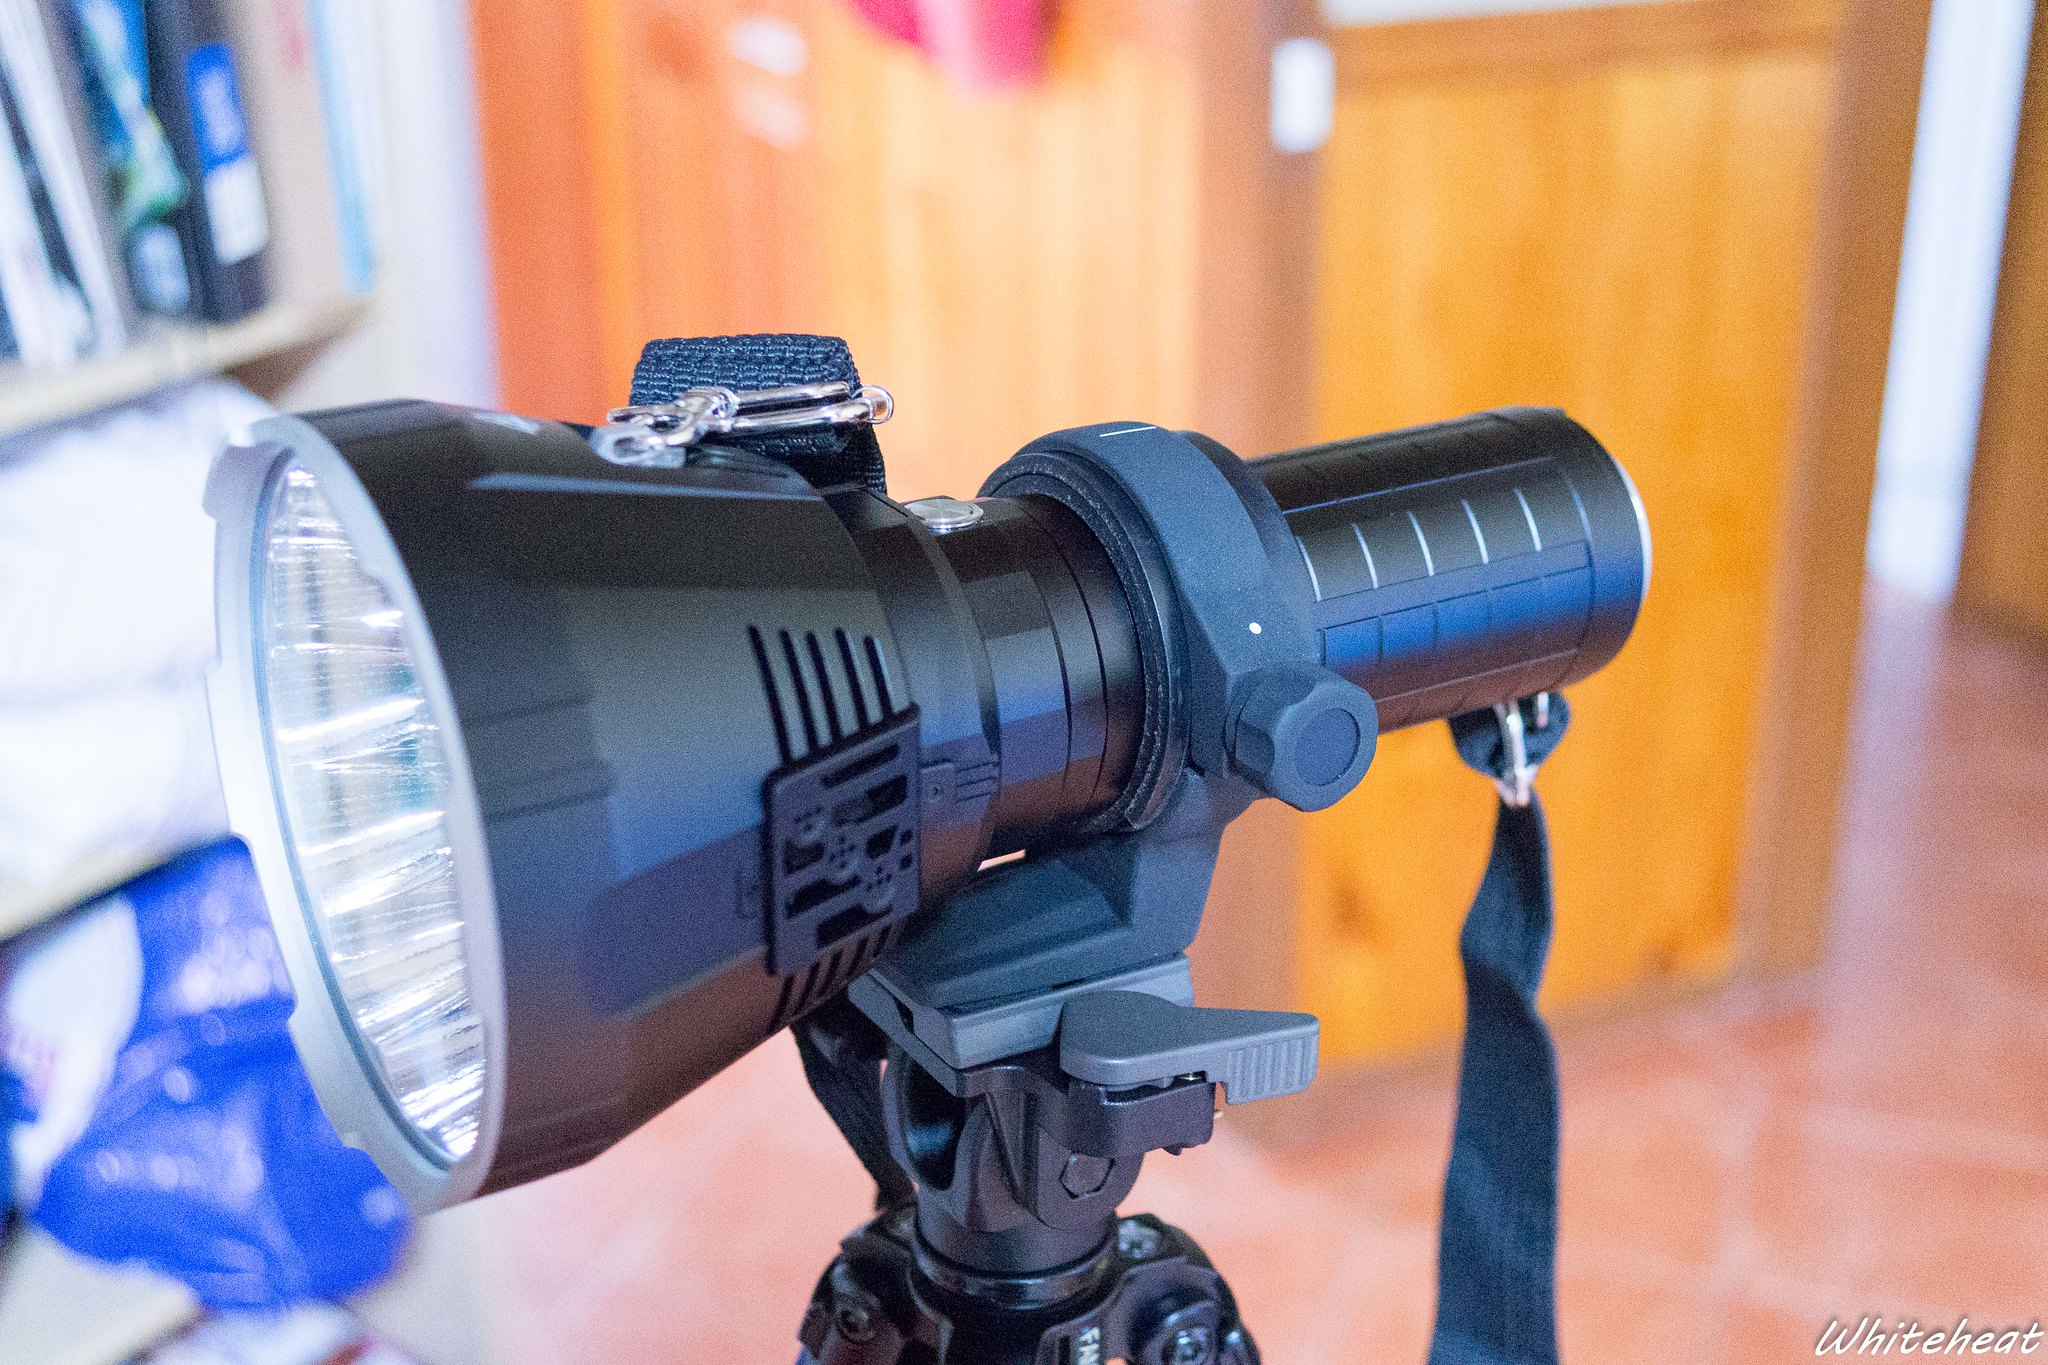 Torch mounted on tripod